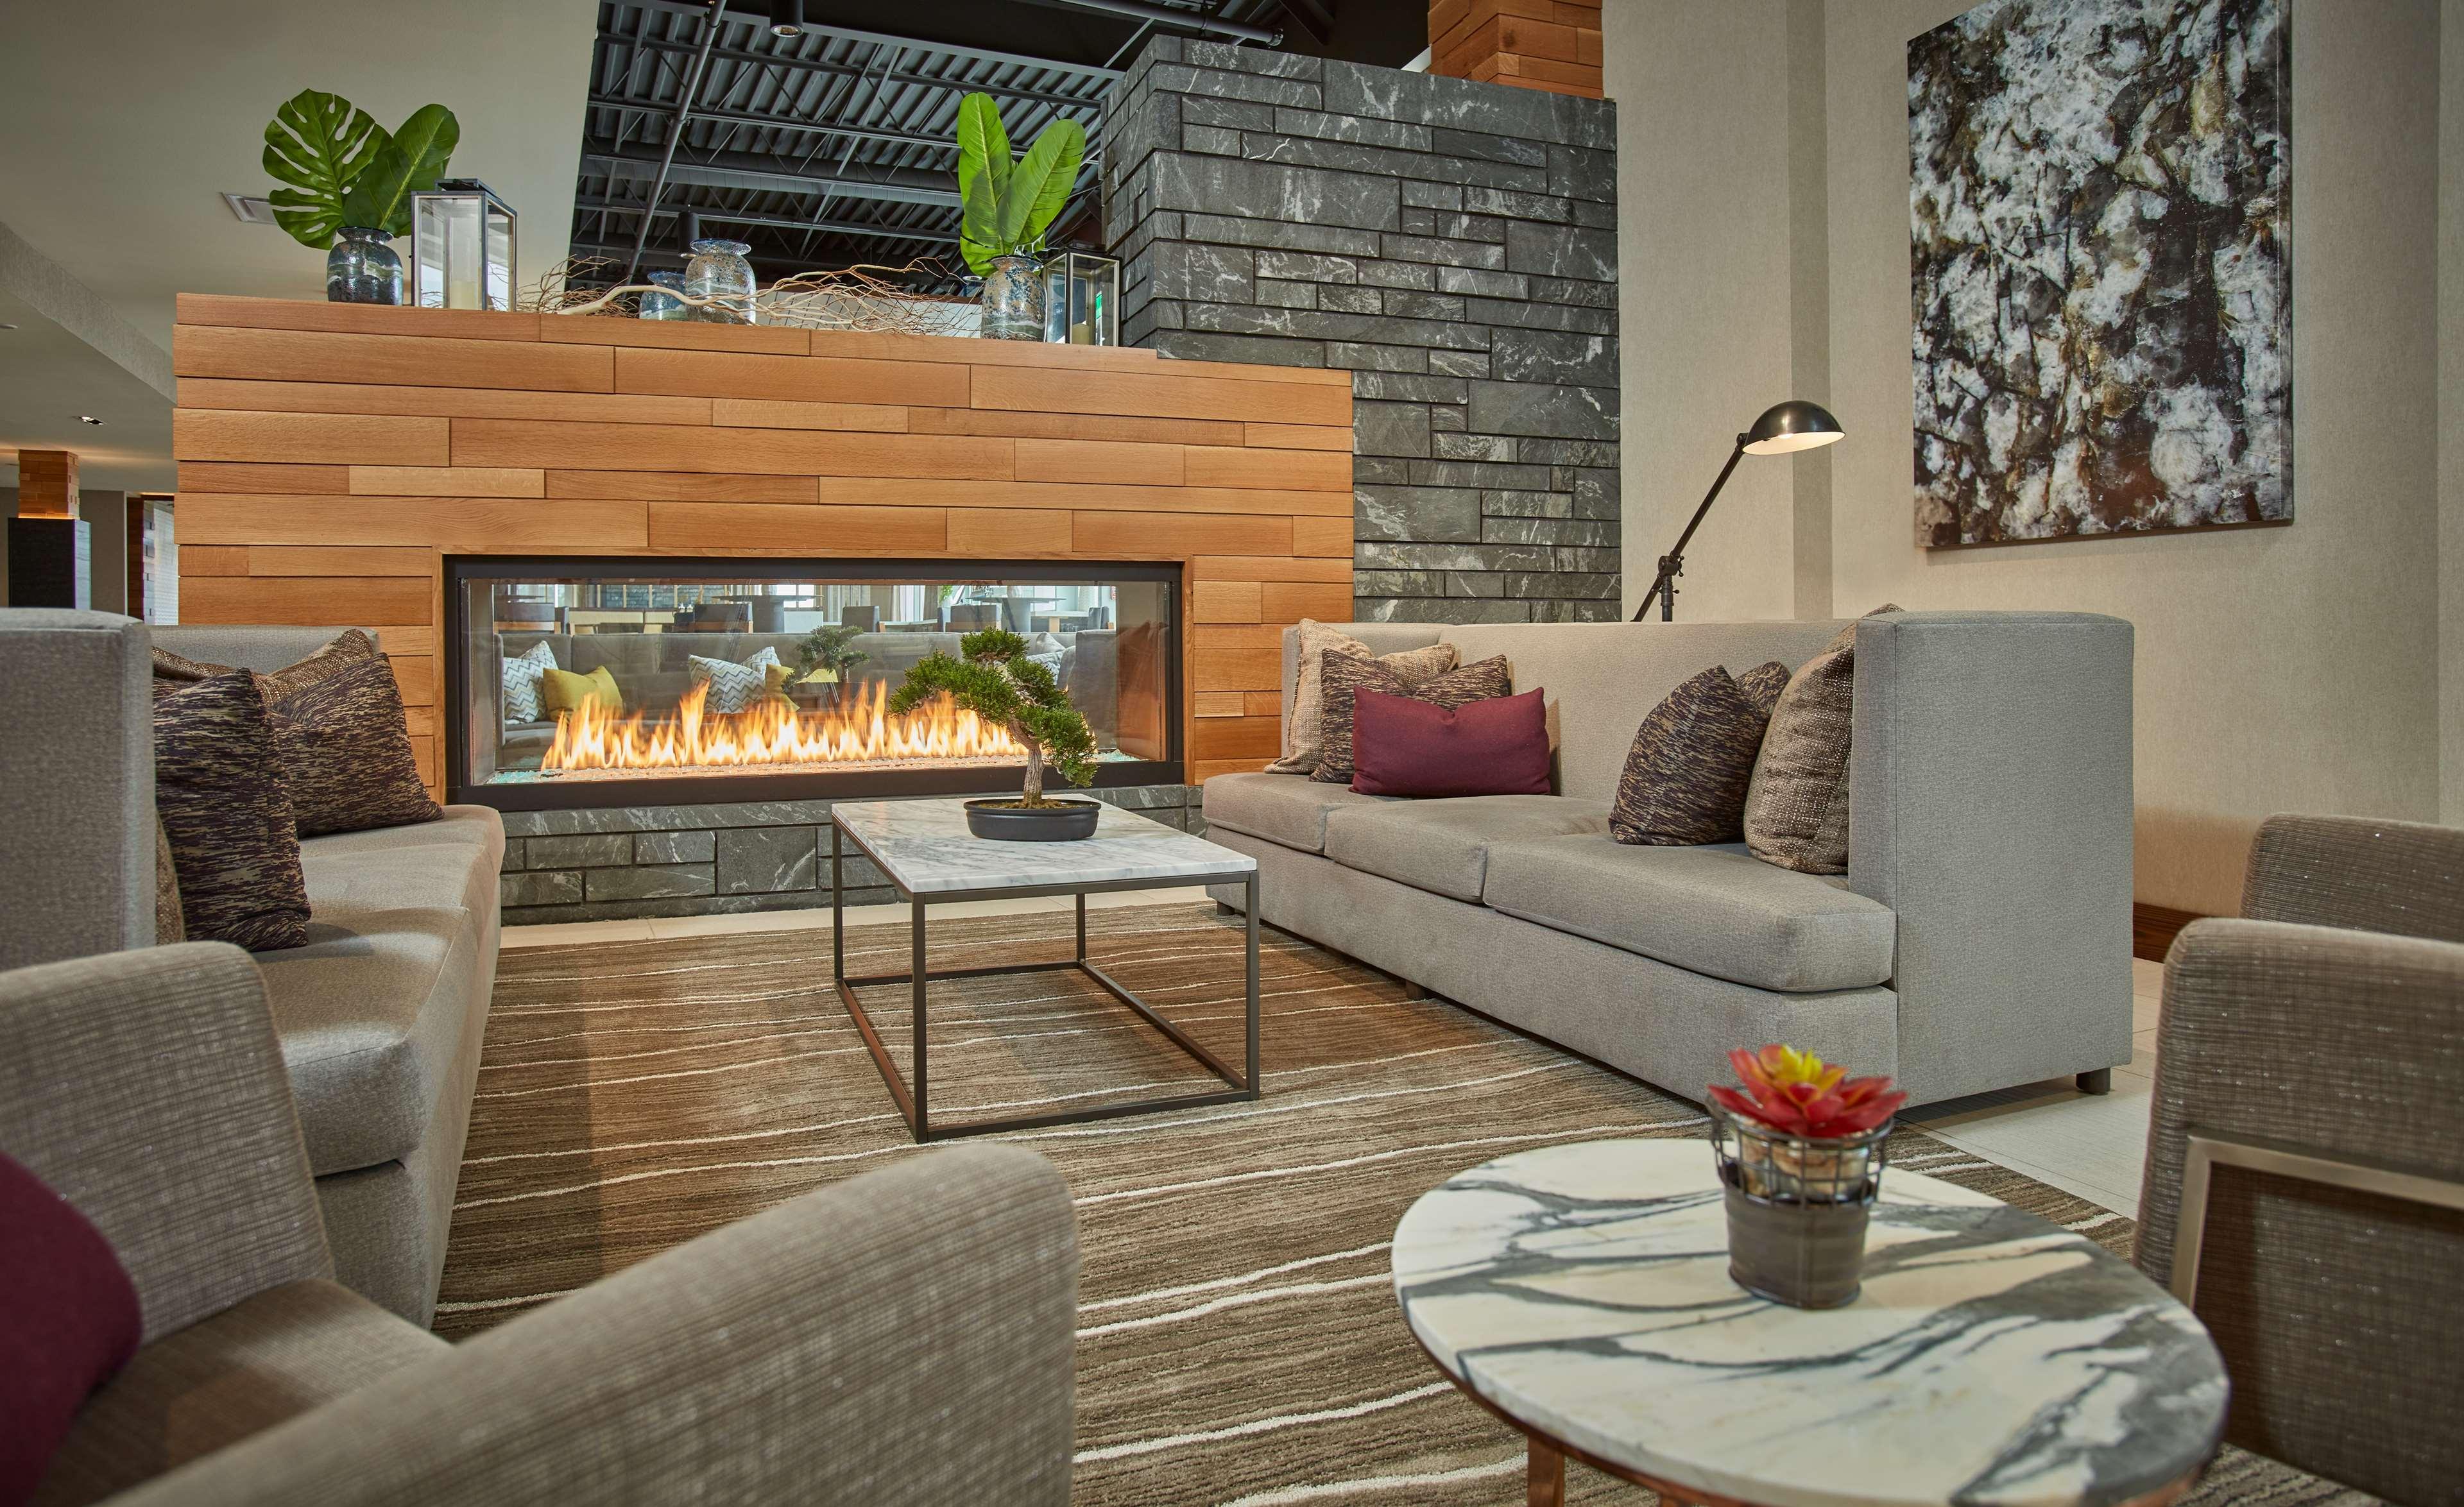 Hilton Garden Inn Wausau image 4